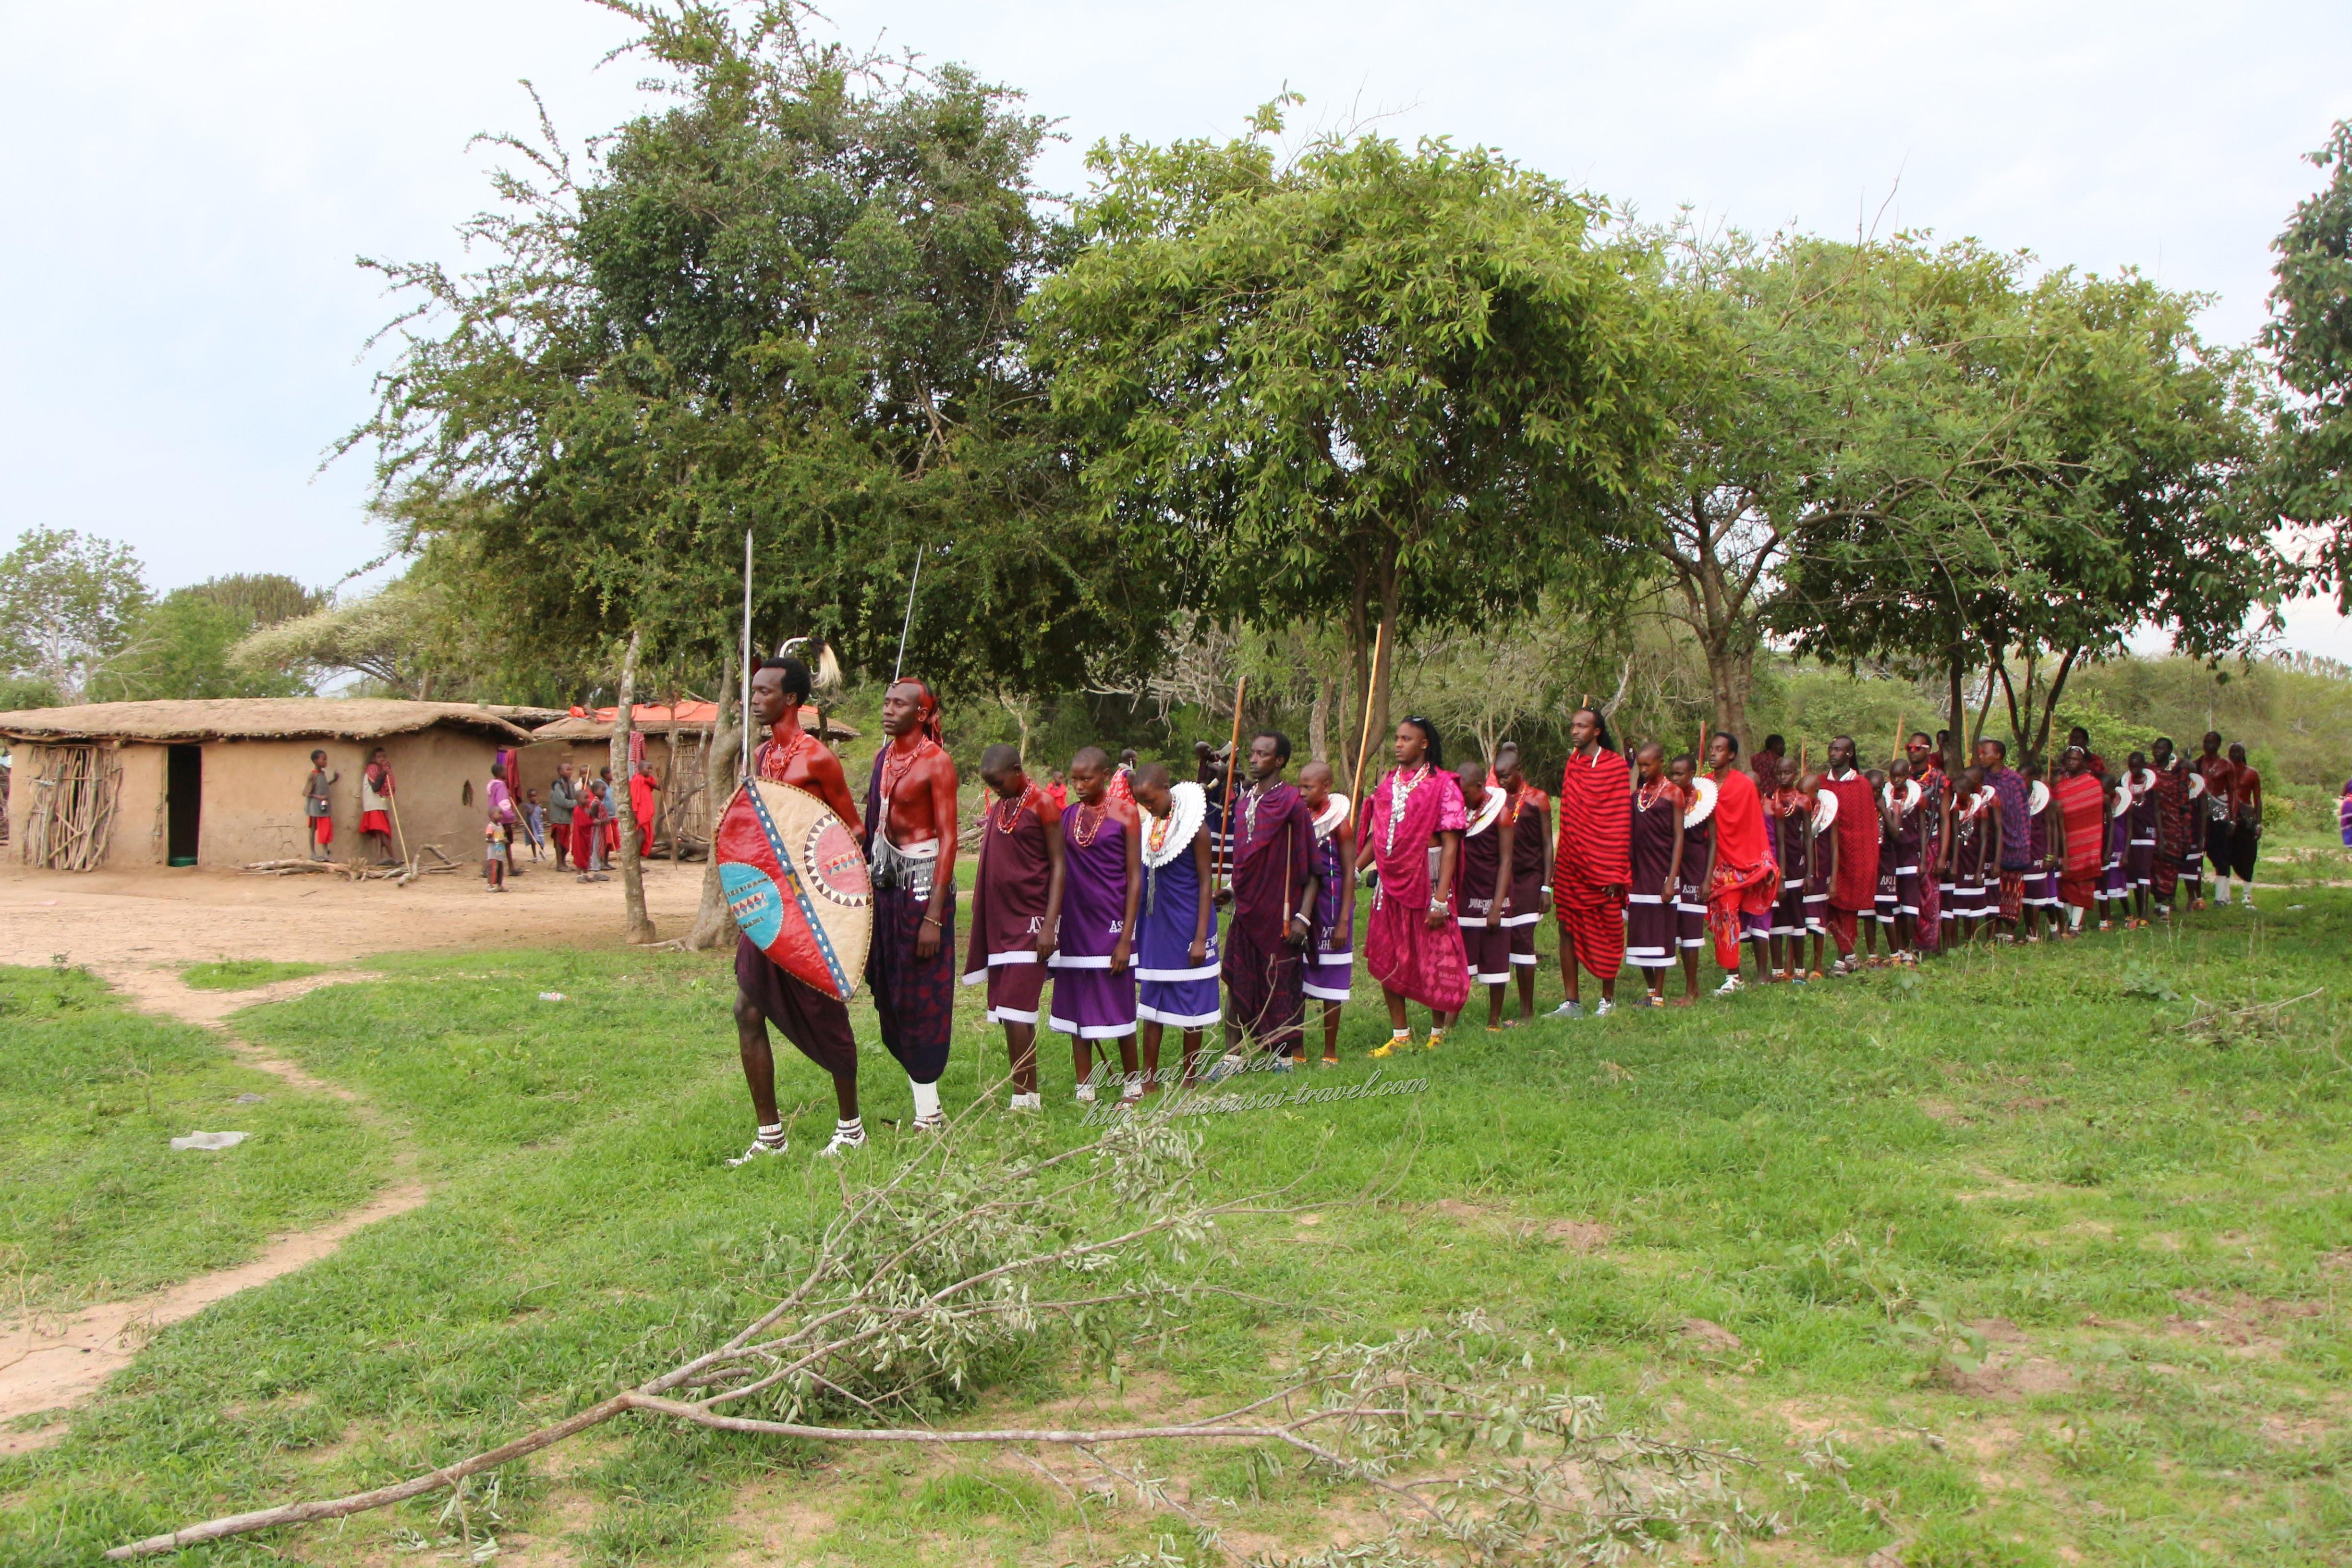 Guerrieri Maasai si avvicinano al recinto dando inizio alla cerimonia